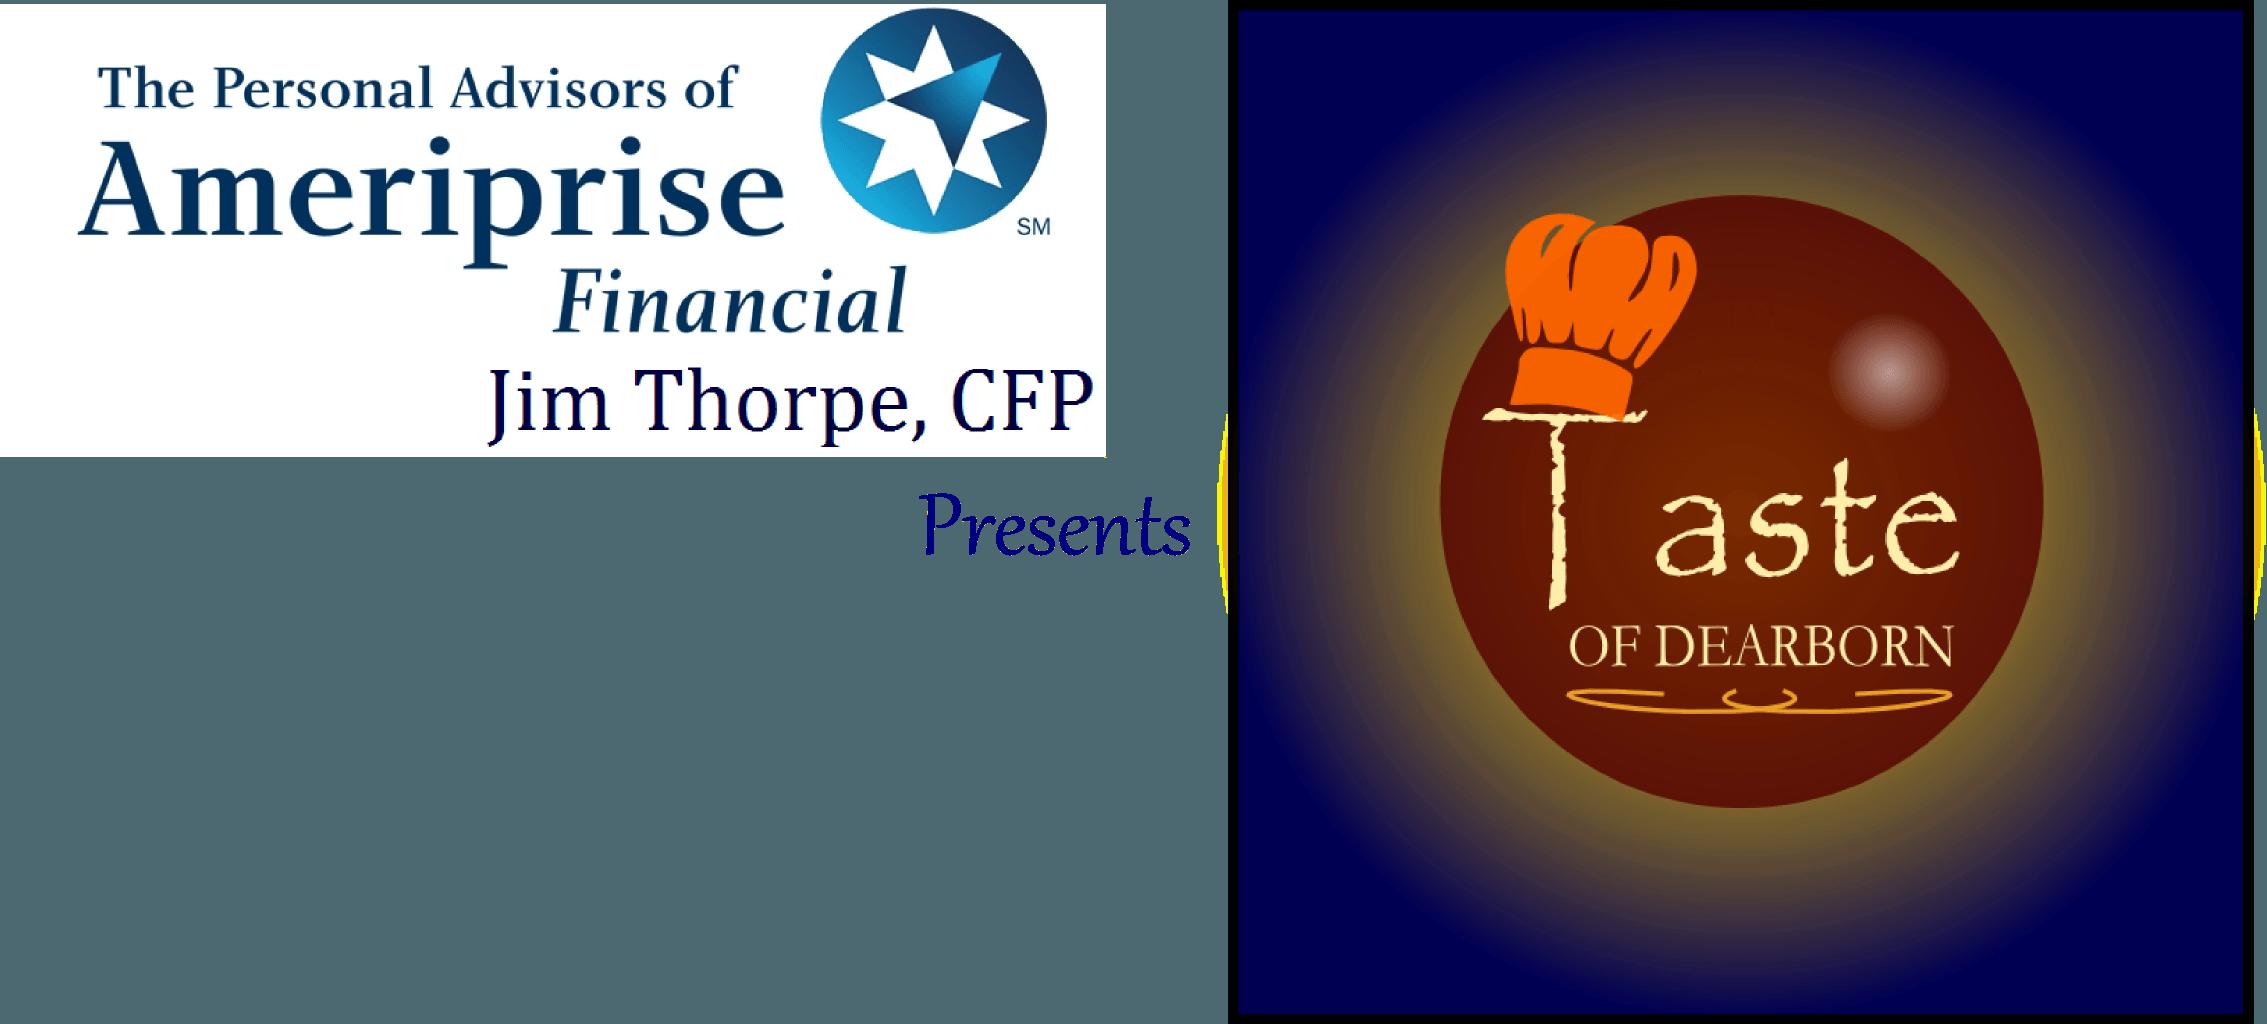 Jim Thorpe Ameriprise Financial presents Taste of Dearborn.